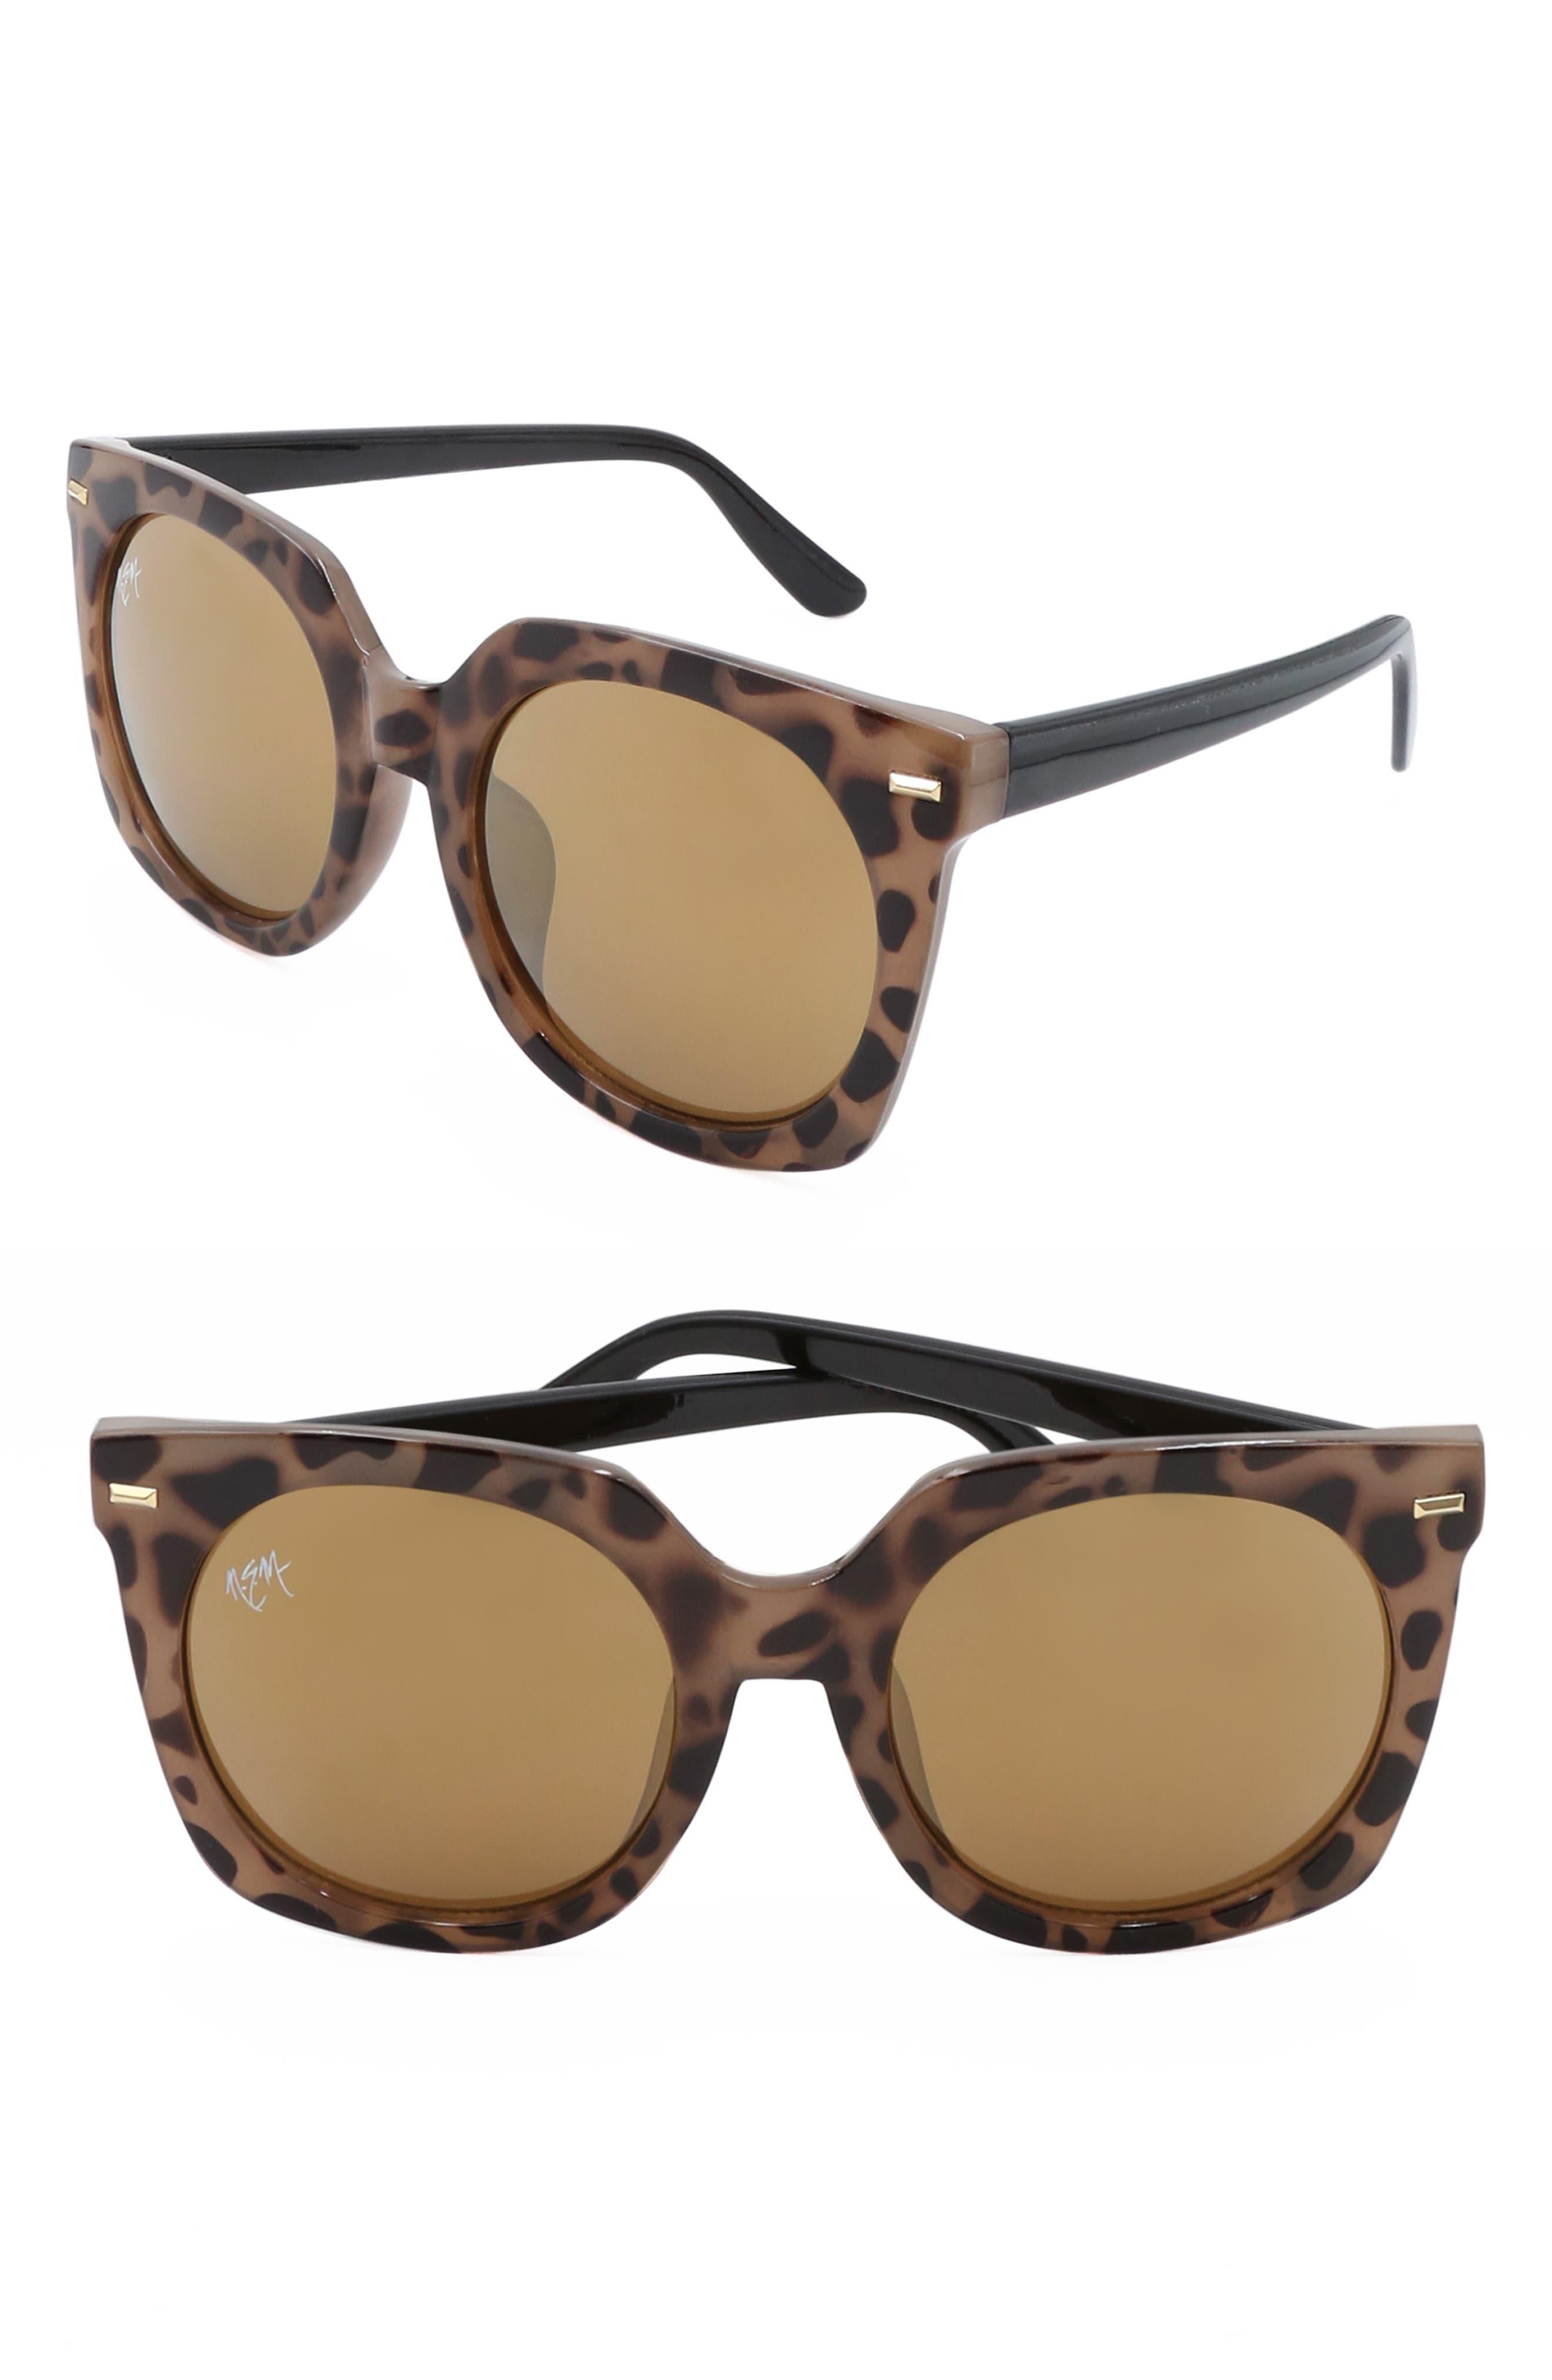 Nem Melrose 55Mm Square Sunglasses - Brown Marble W Amber Lens